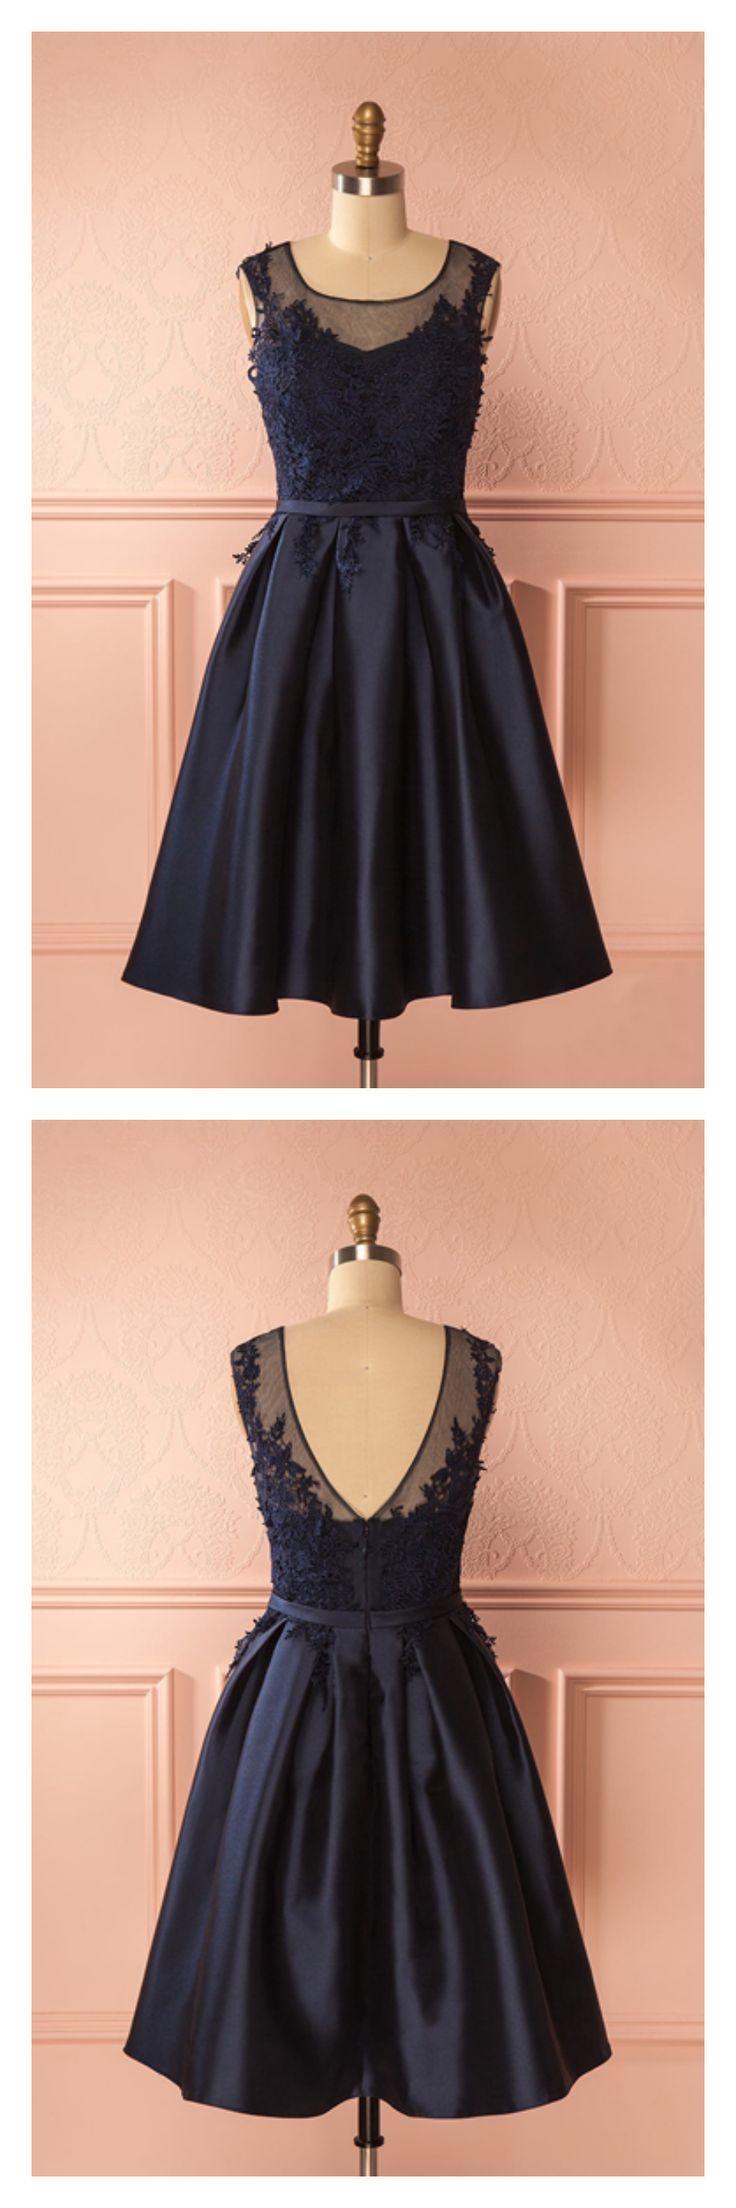 Mariage - A Line Navy Blue Round Neck Applique Knee Length Homecoming Dresses Party Dresses Prom Dresses Graduation Dresses(ED1806)